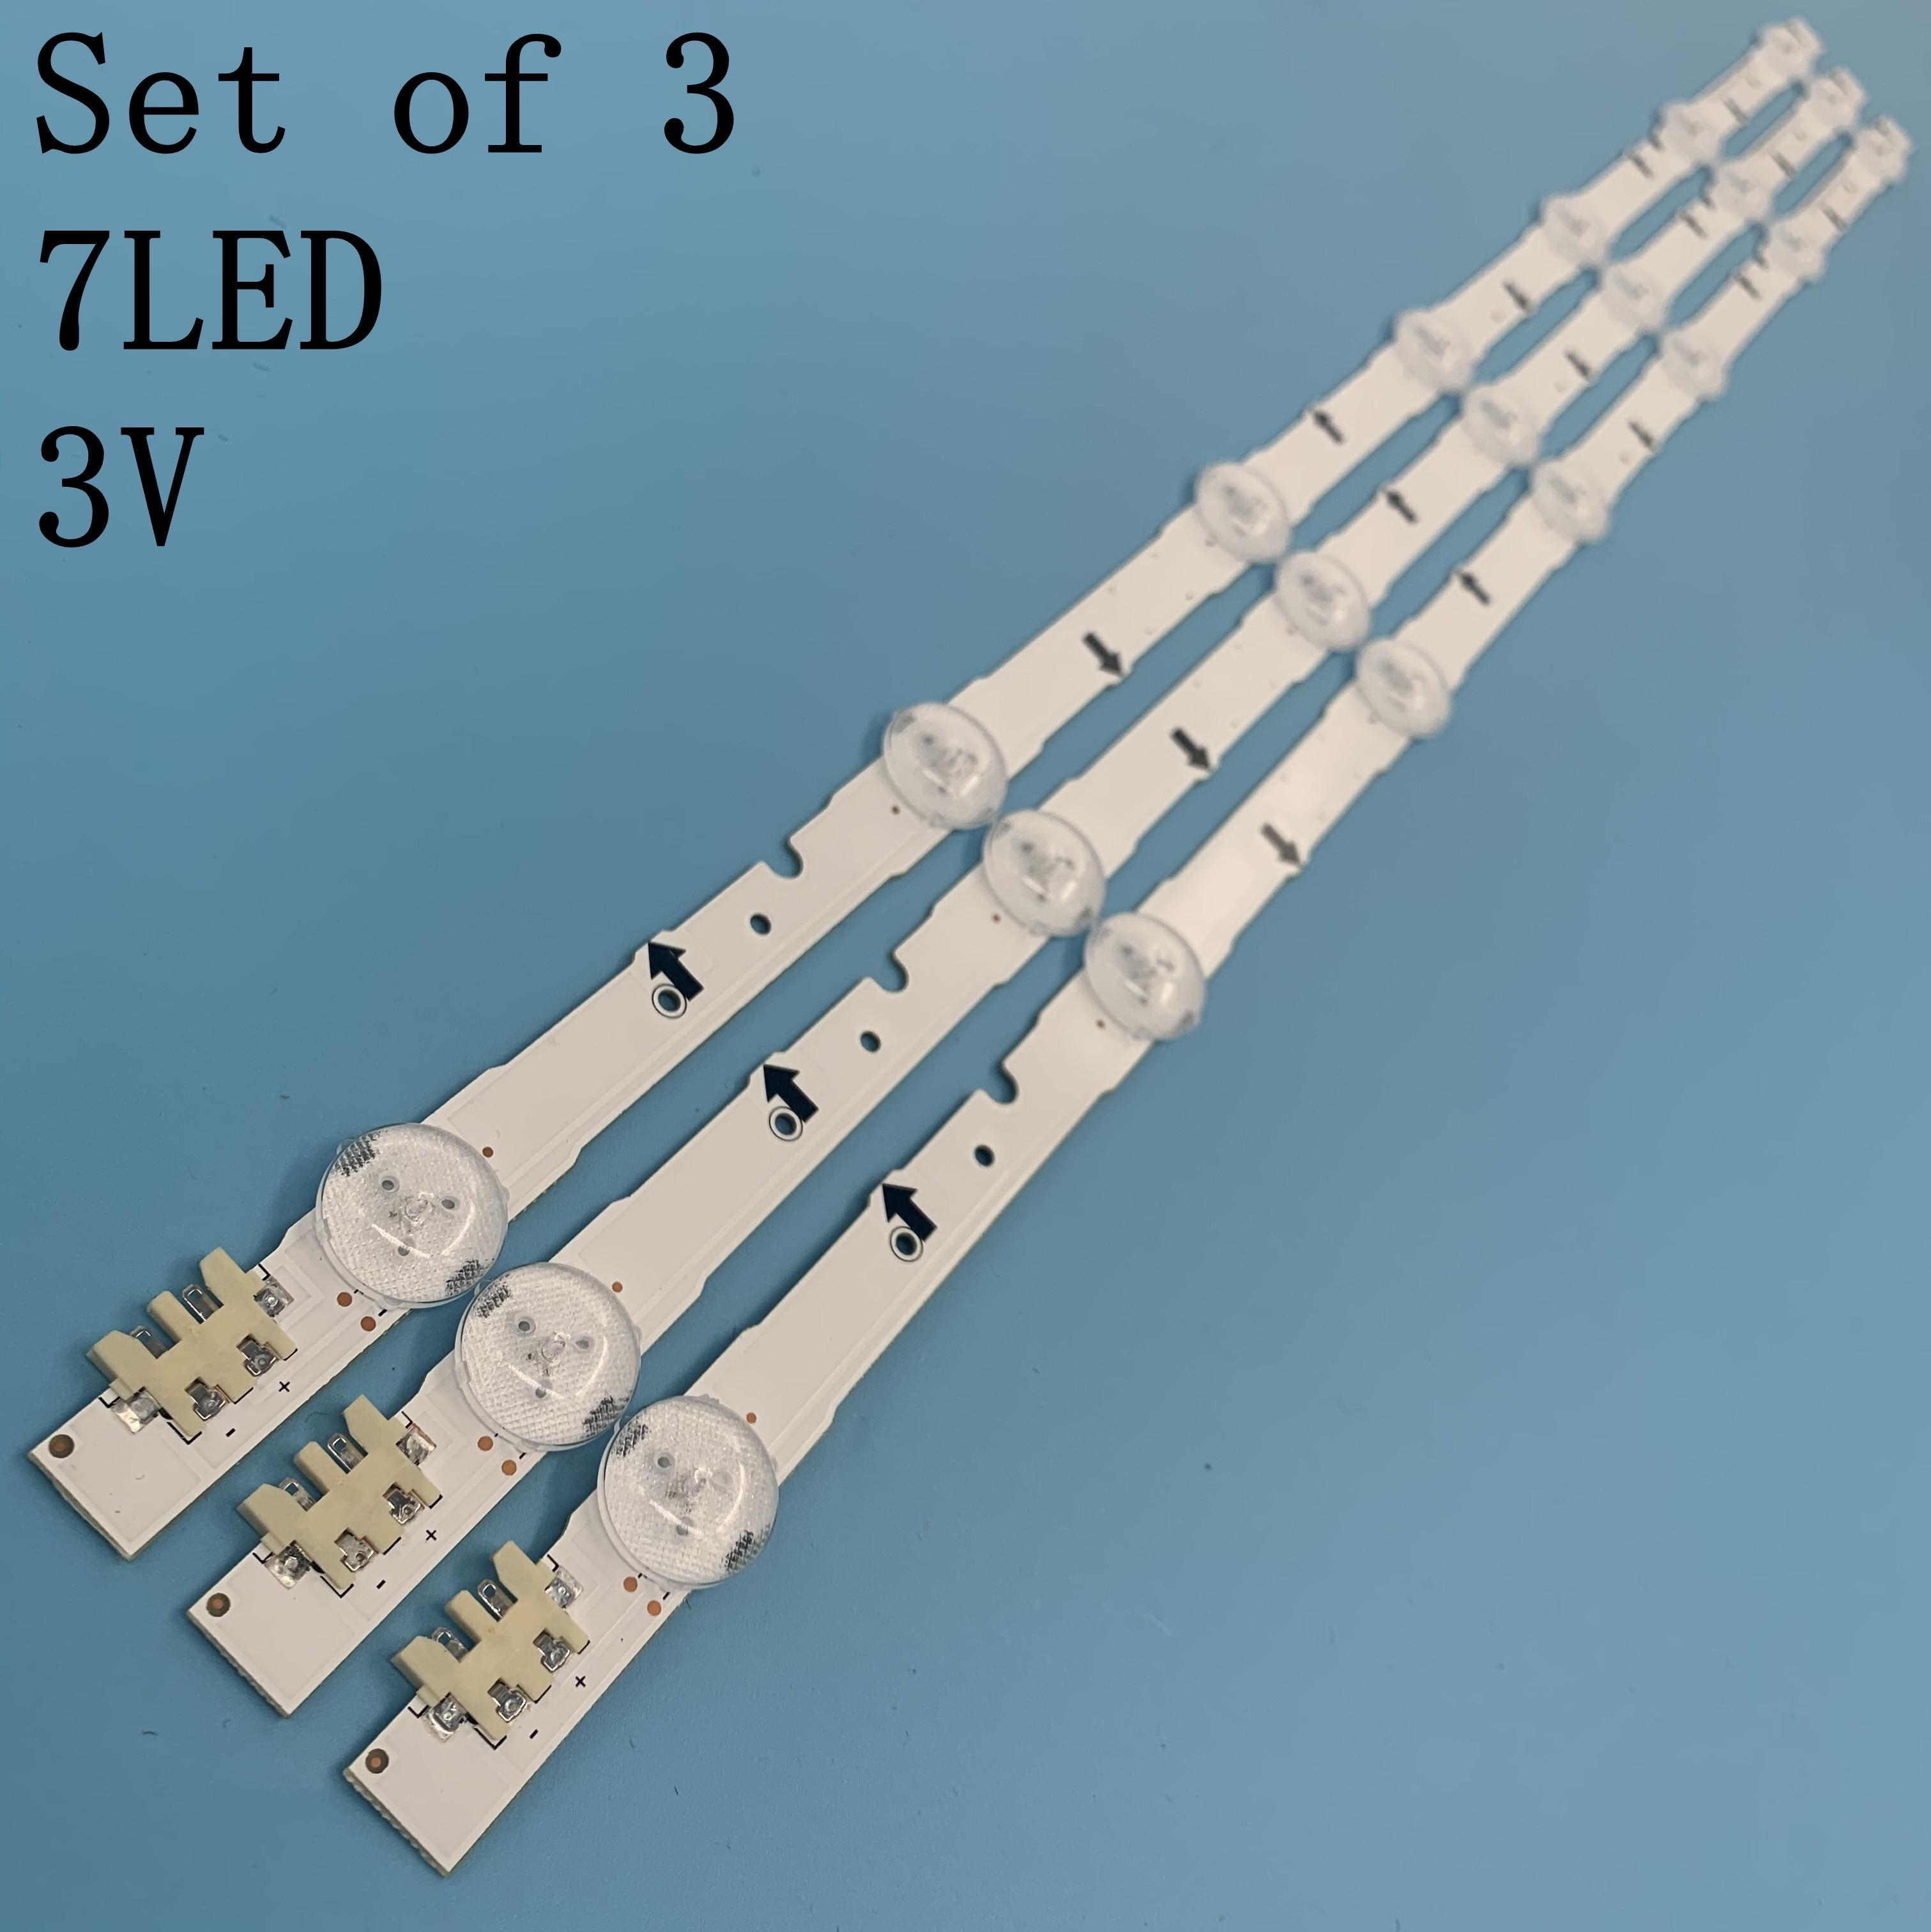 650mm LED Backlight Lamp Strip 7leds For Sam Sung 32 Inch TV 2014SVS32HD D4GE-320DC0-R3 CY-HH032AGLV2H BN41-02169A BN96-30445A